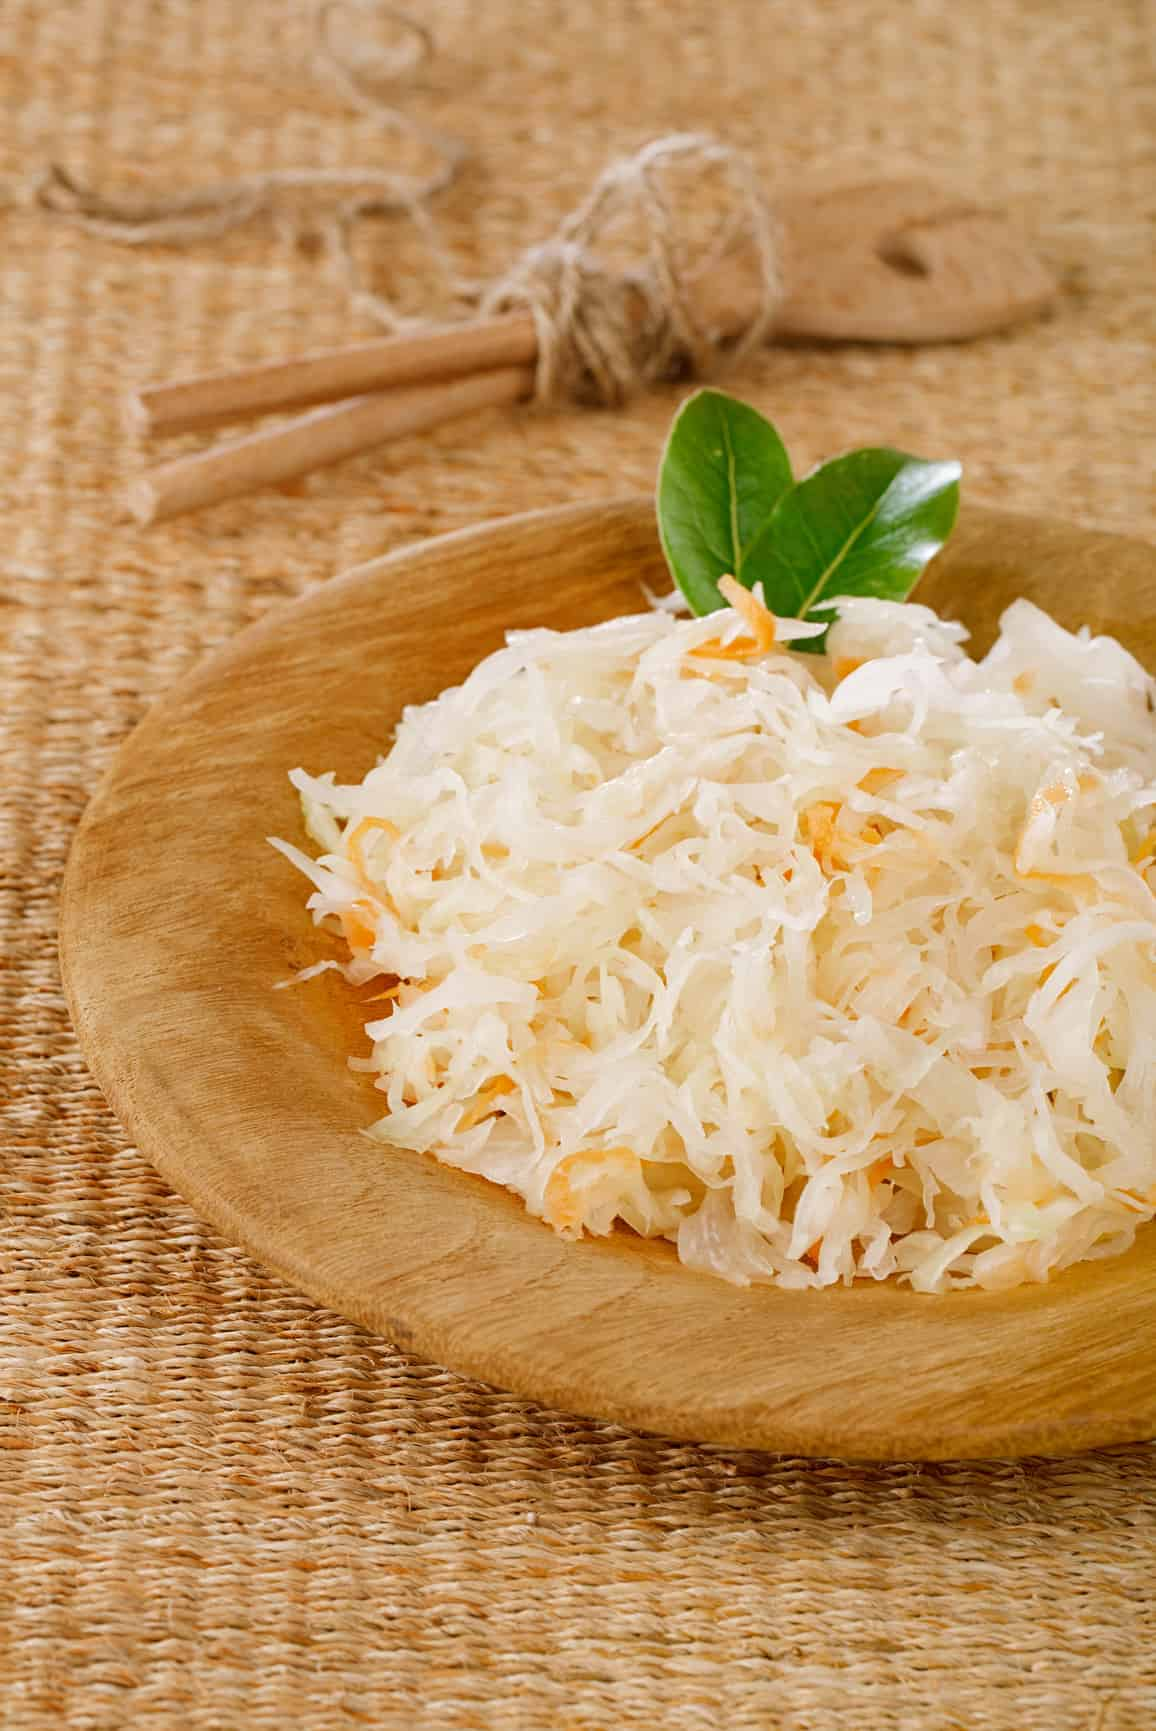 Fermented Foods: A Primer!